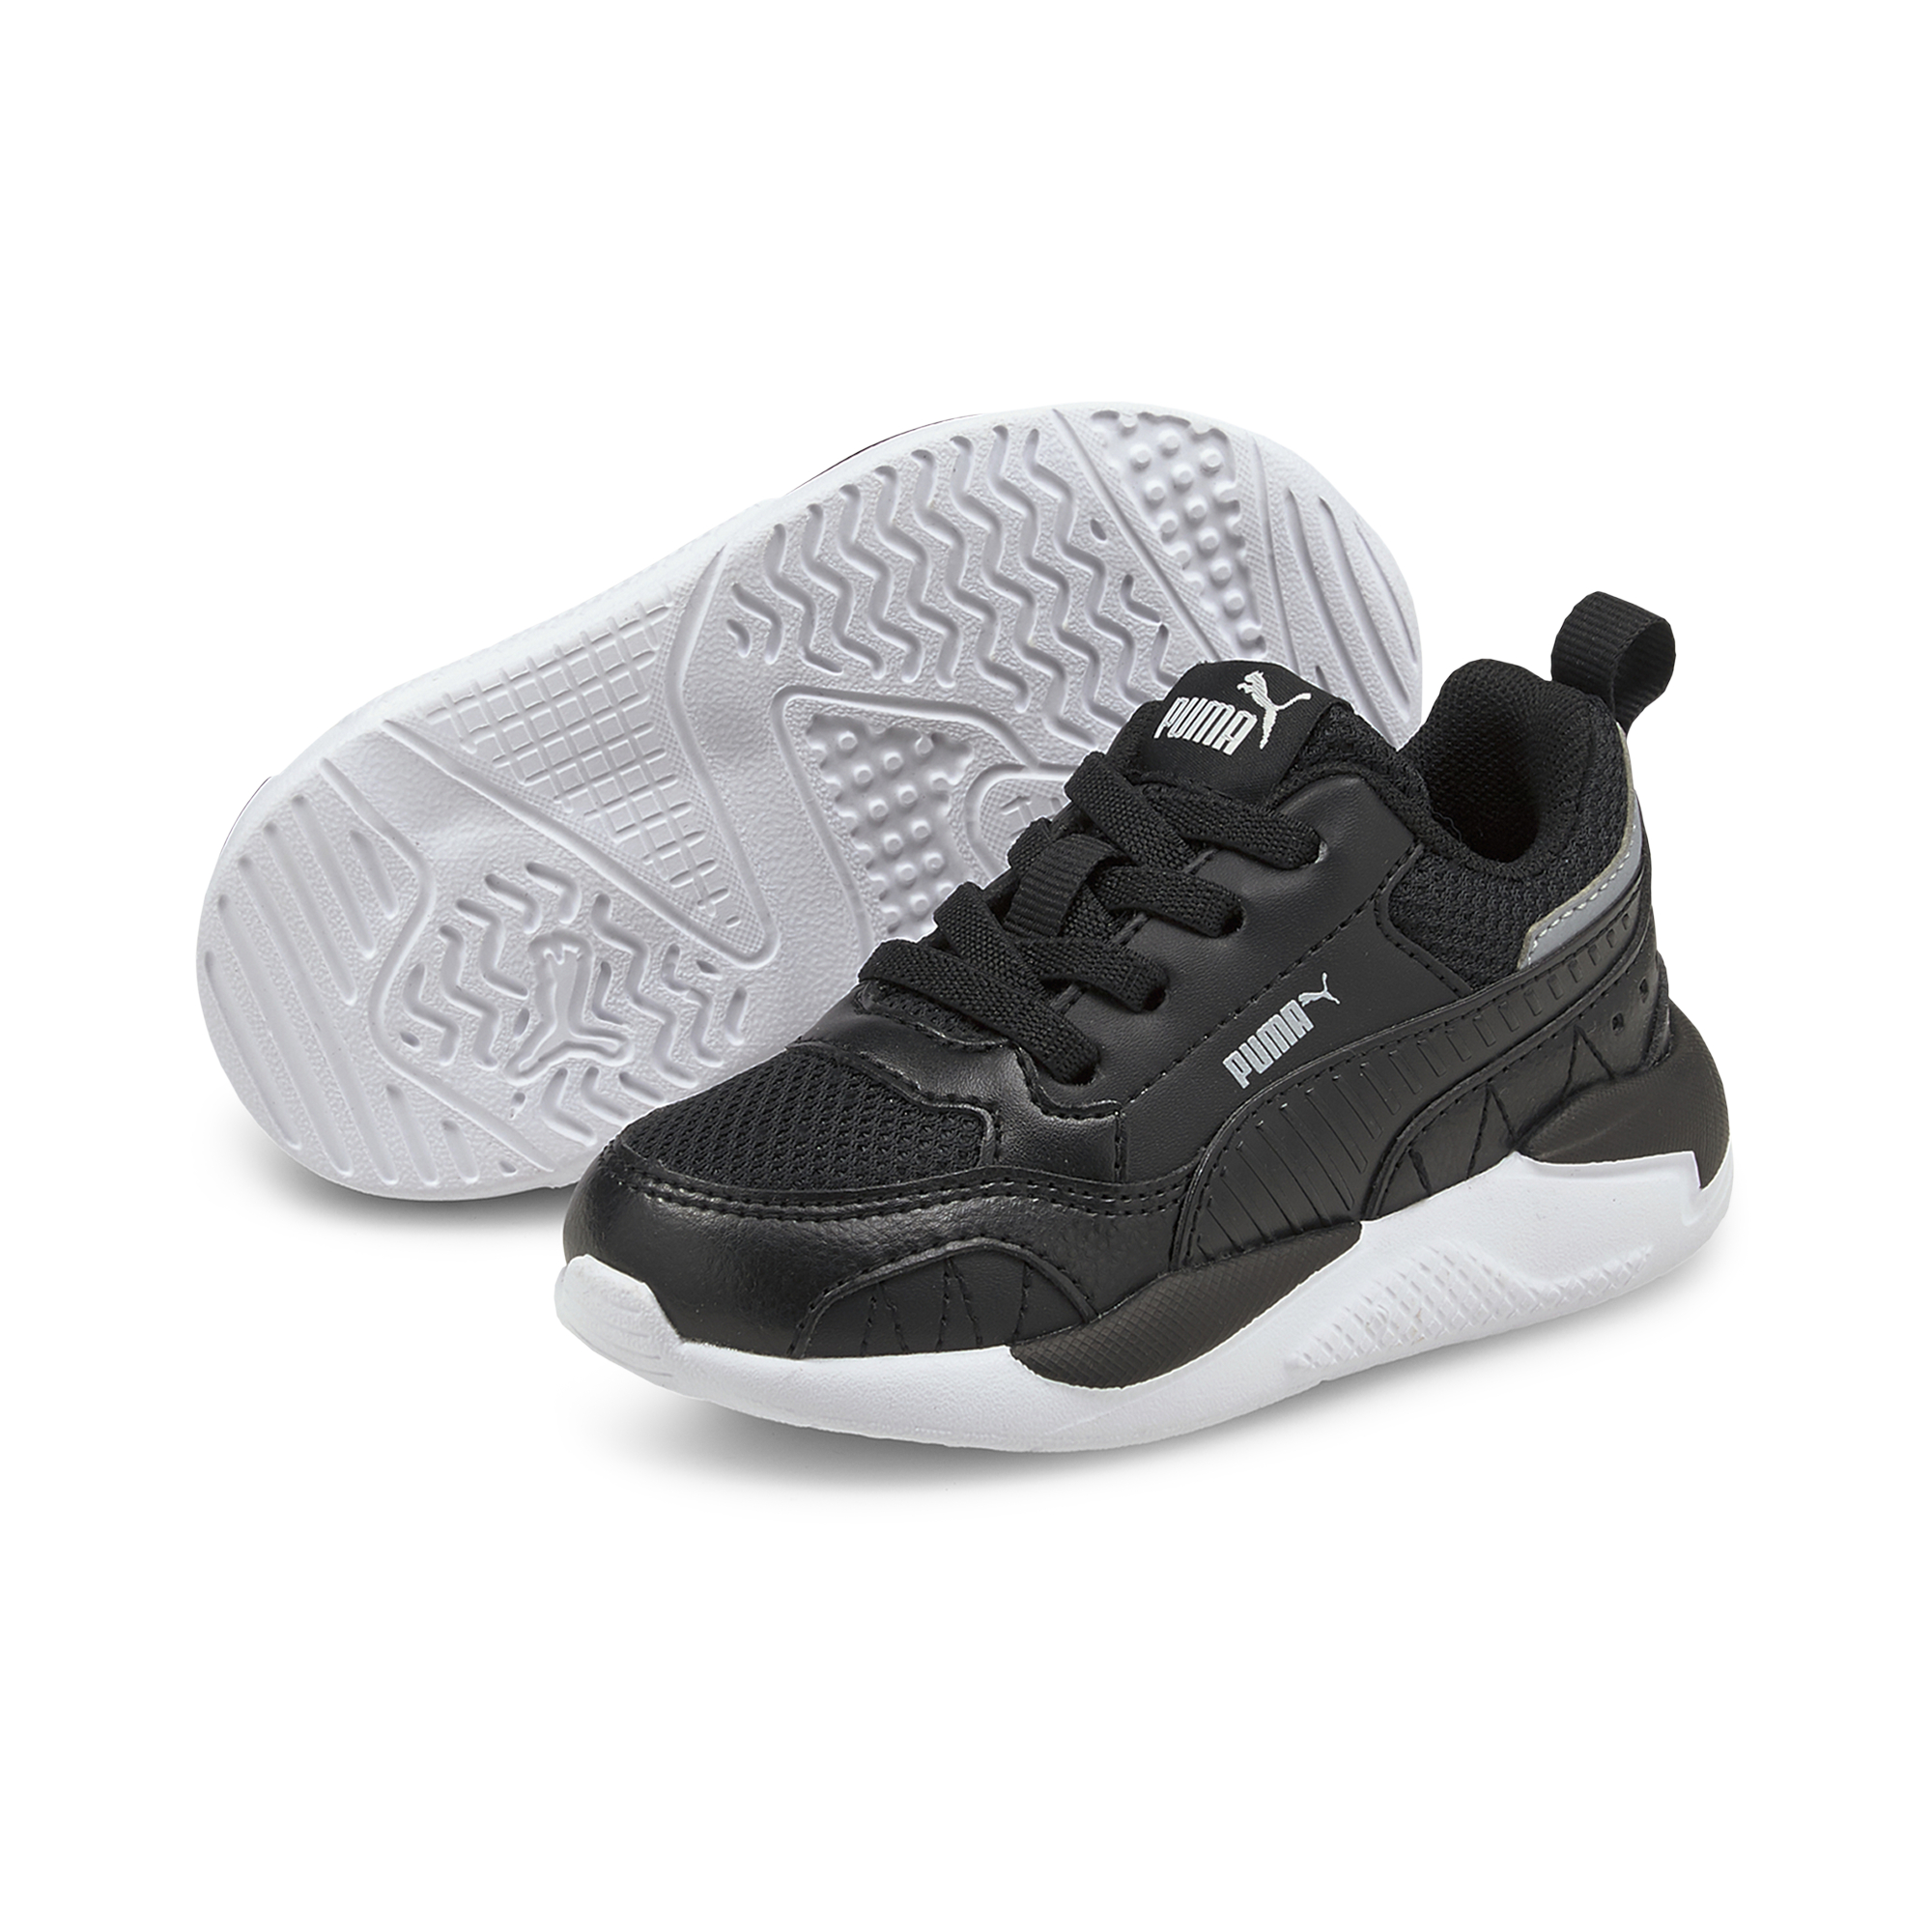 Puma X-Ray 2 Toddler Sneakers, Sort, 23